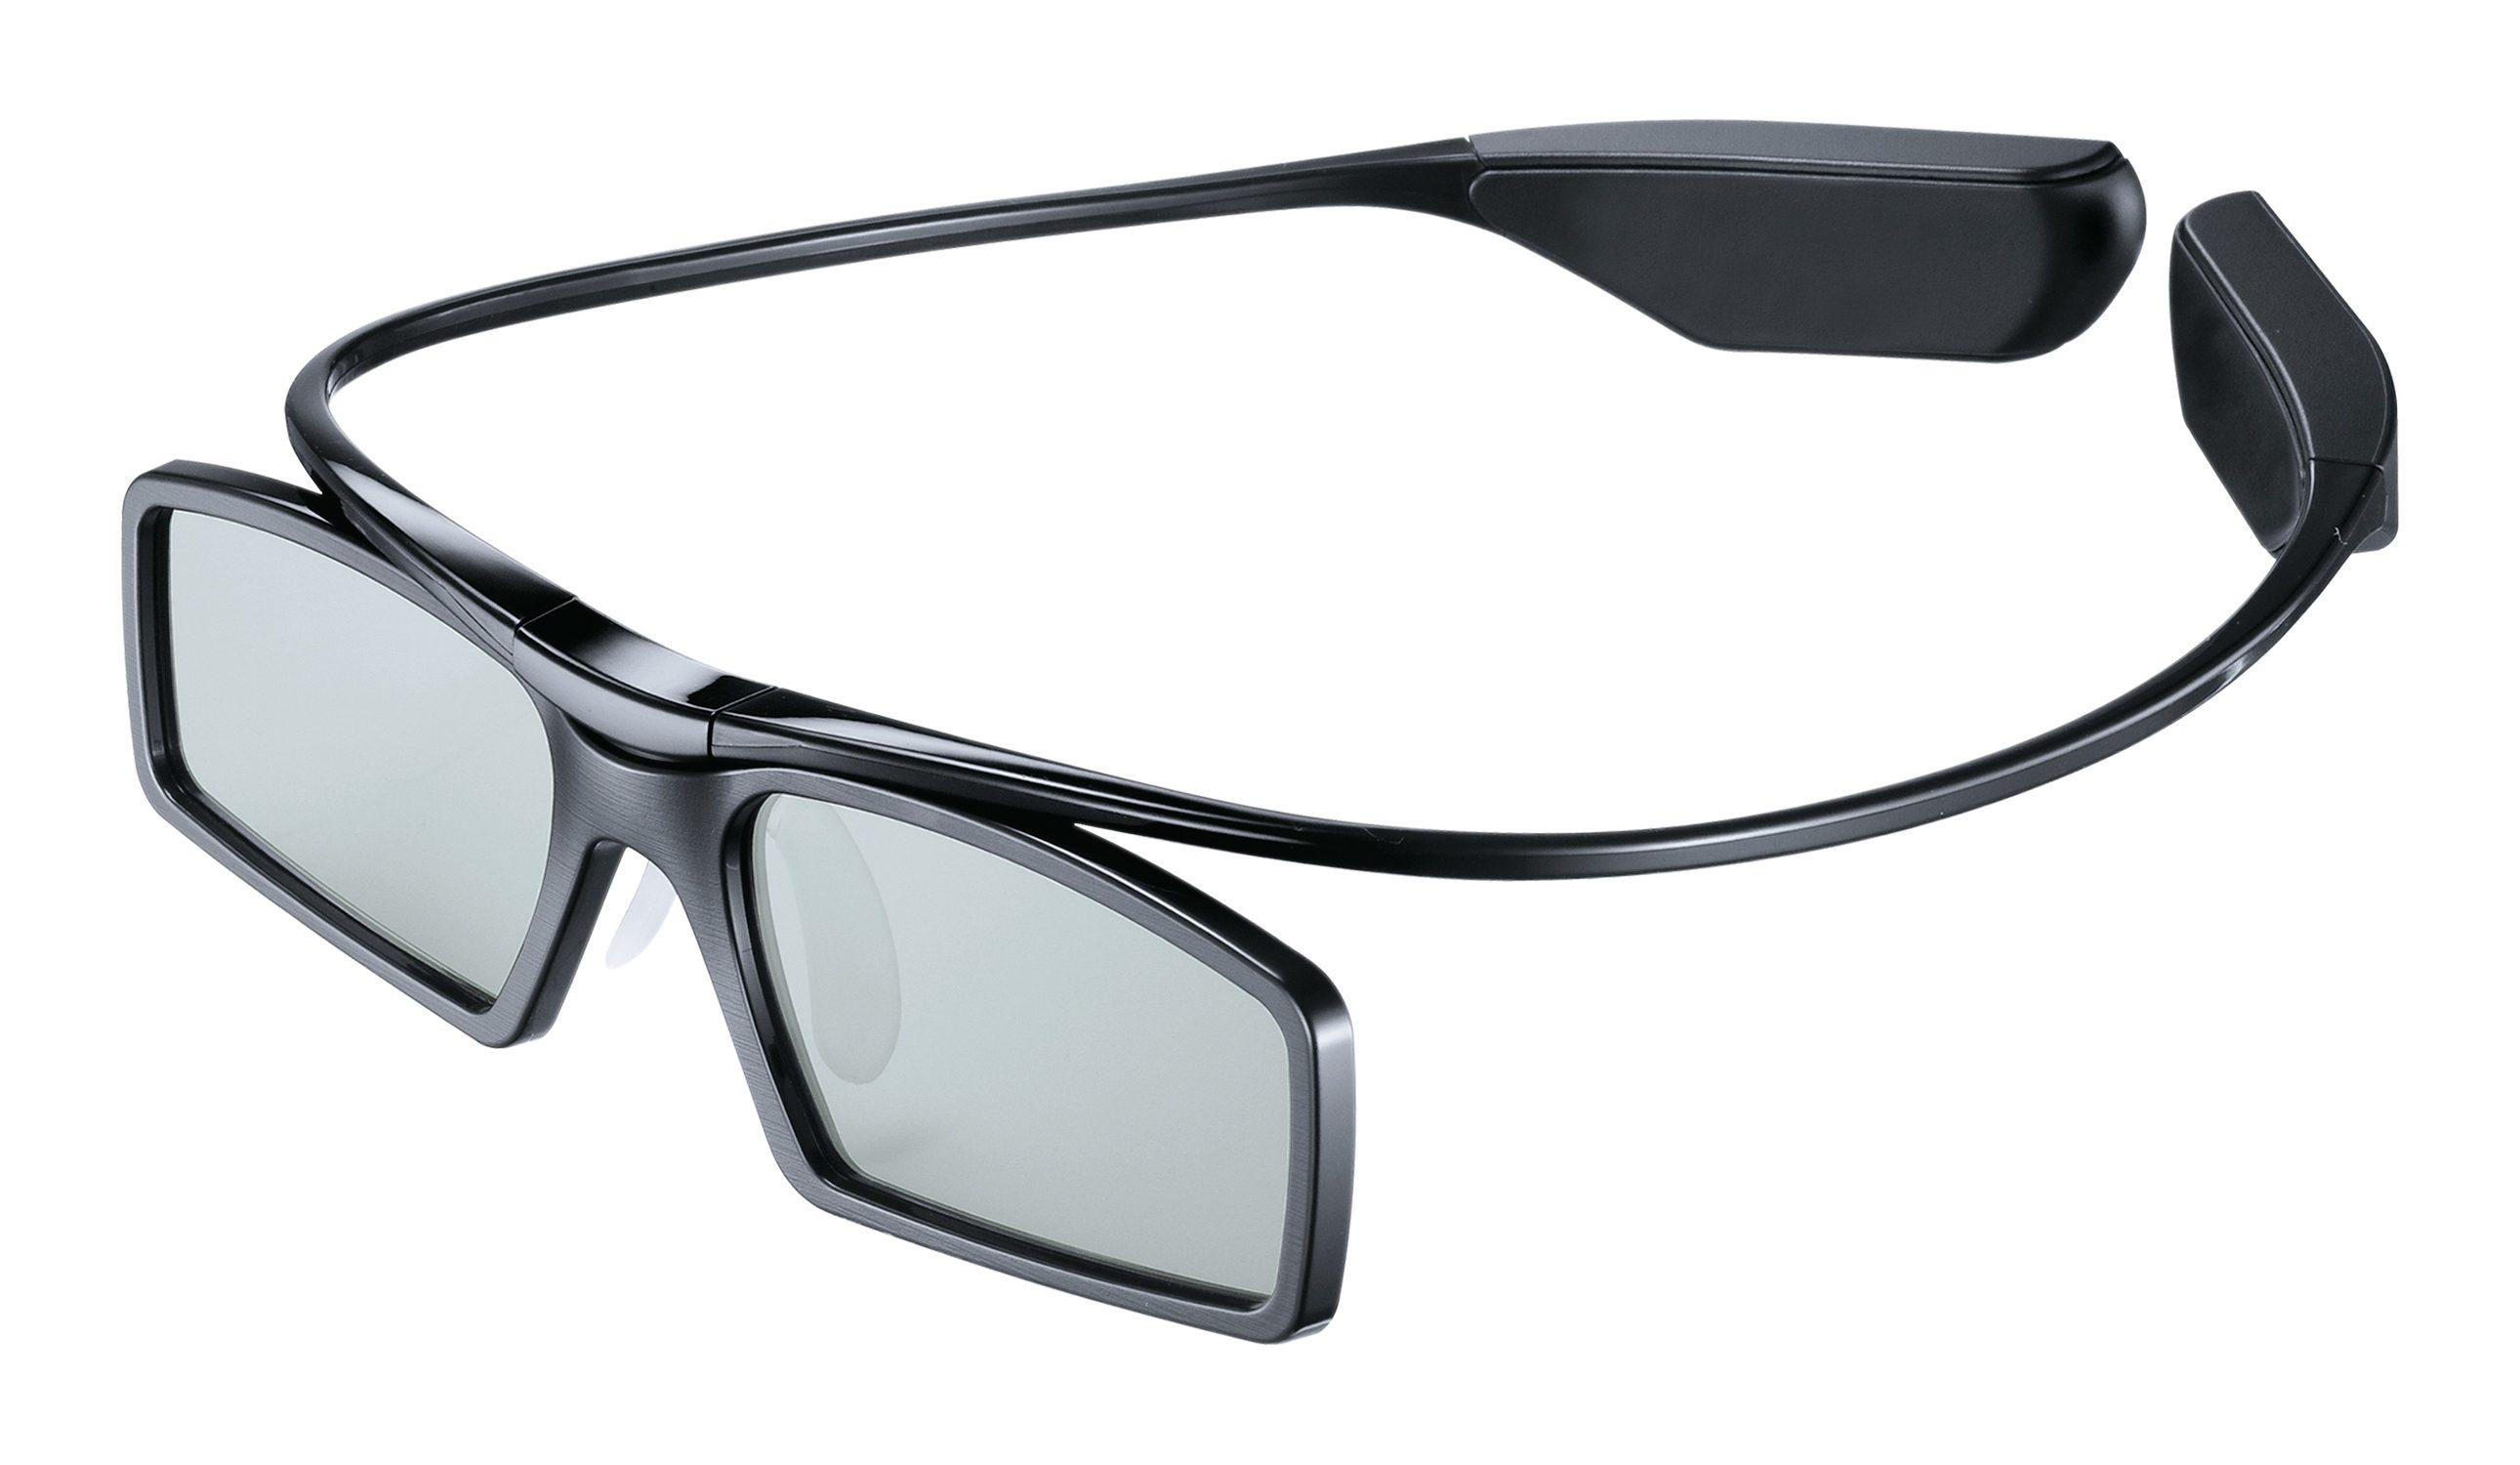 Samsung SSG-3570CR 3D-Brille 3D-Active-Shutter-Brille